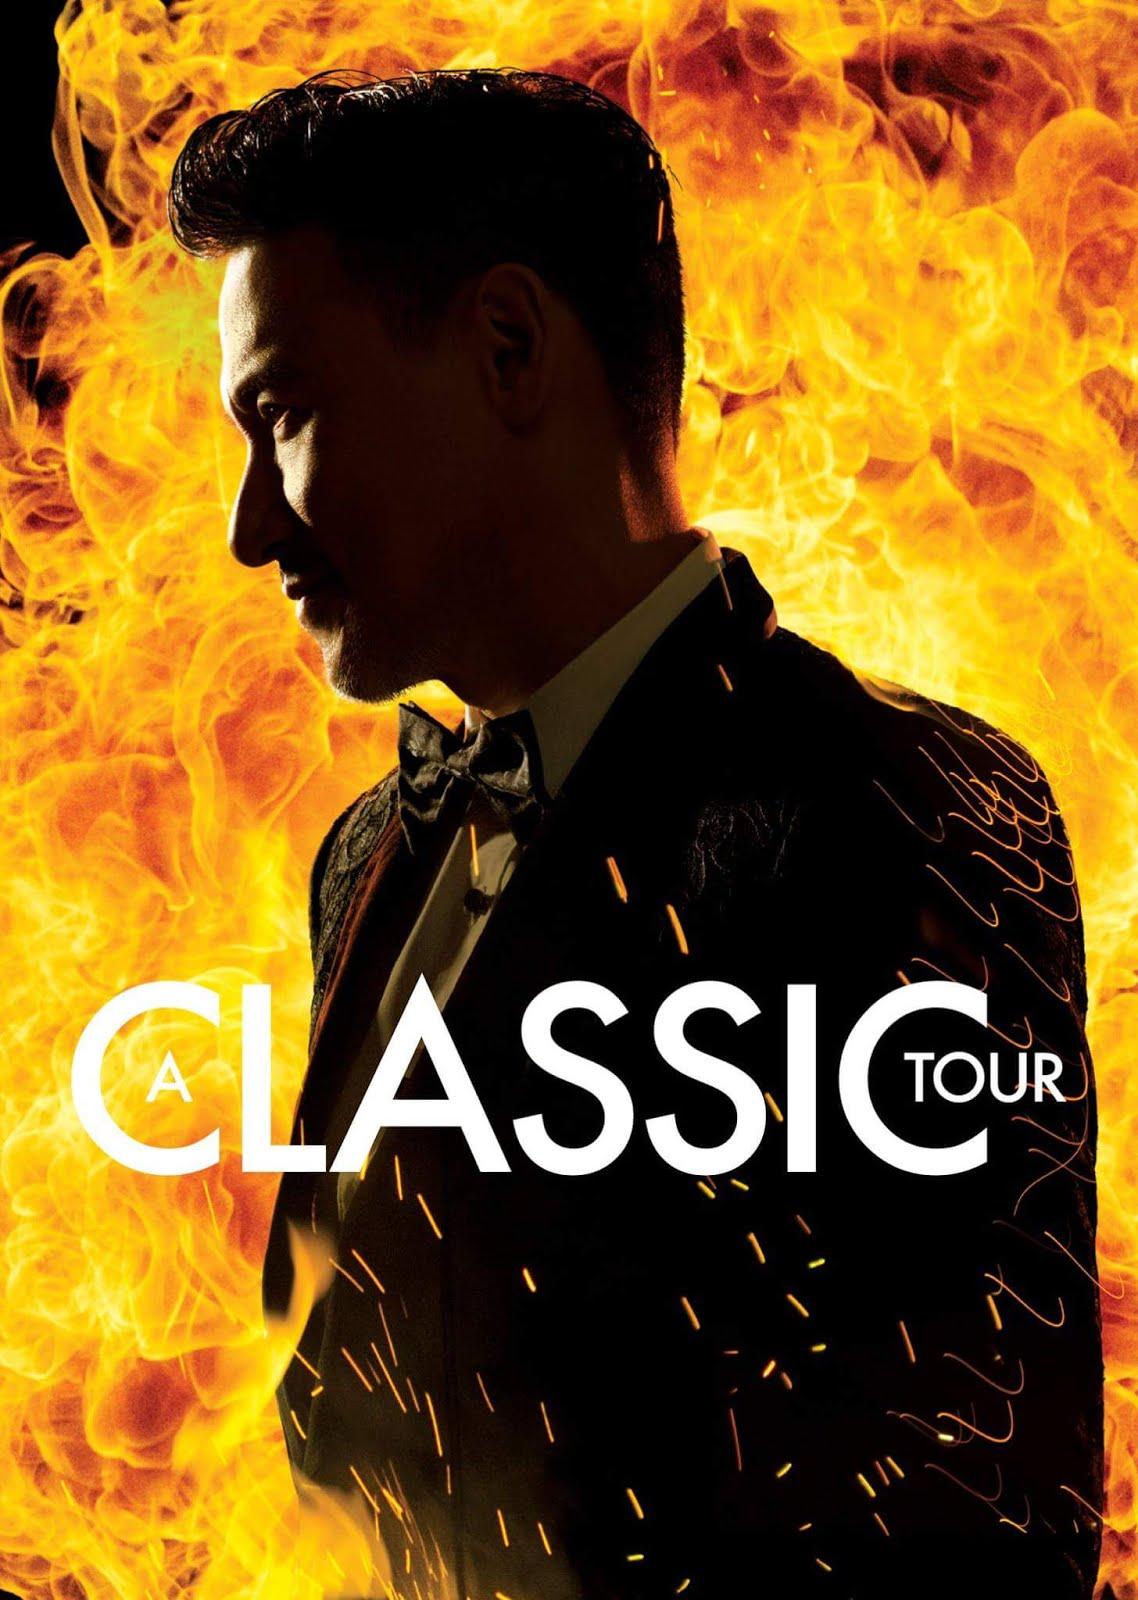 Jacky Cheung 2016 - 2018 Concert